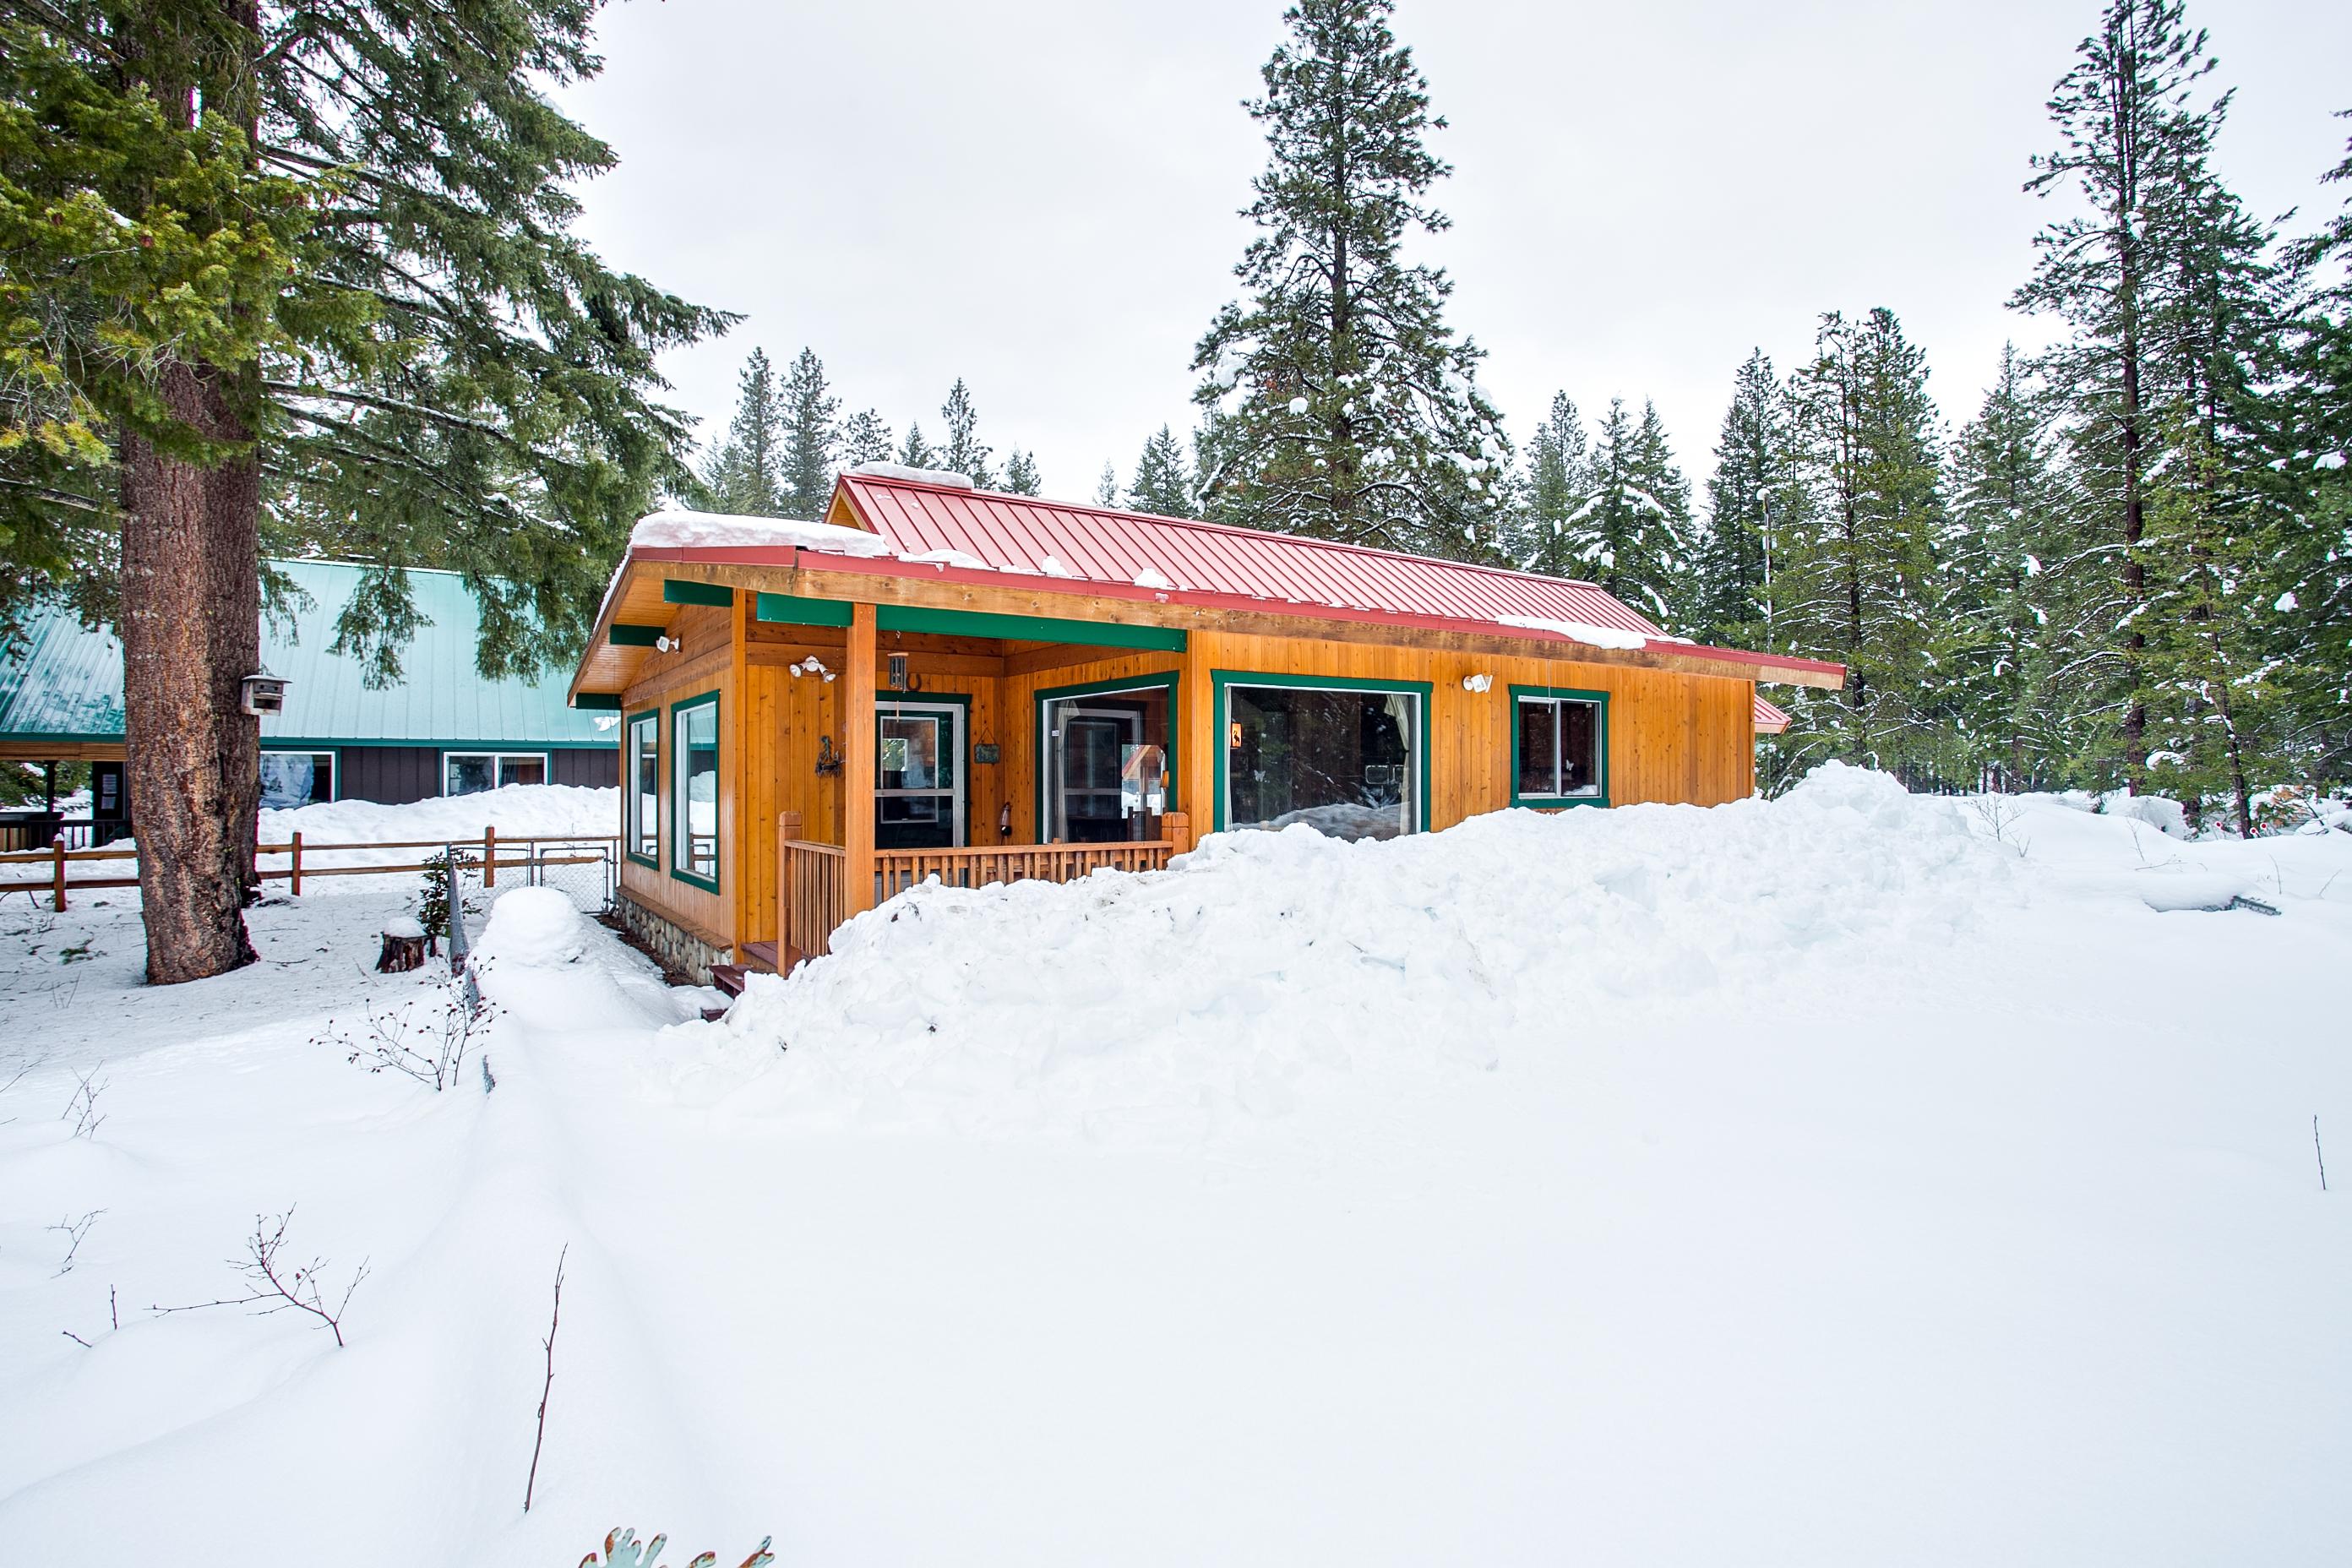 Rivers Edge Nw Comfy Cabins Vacation Rentals